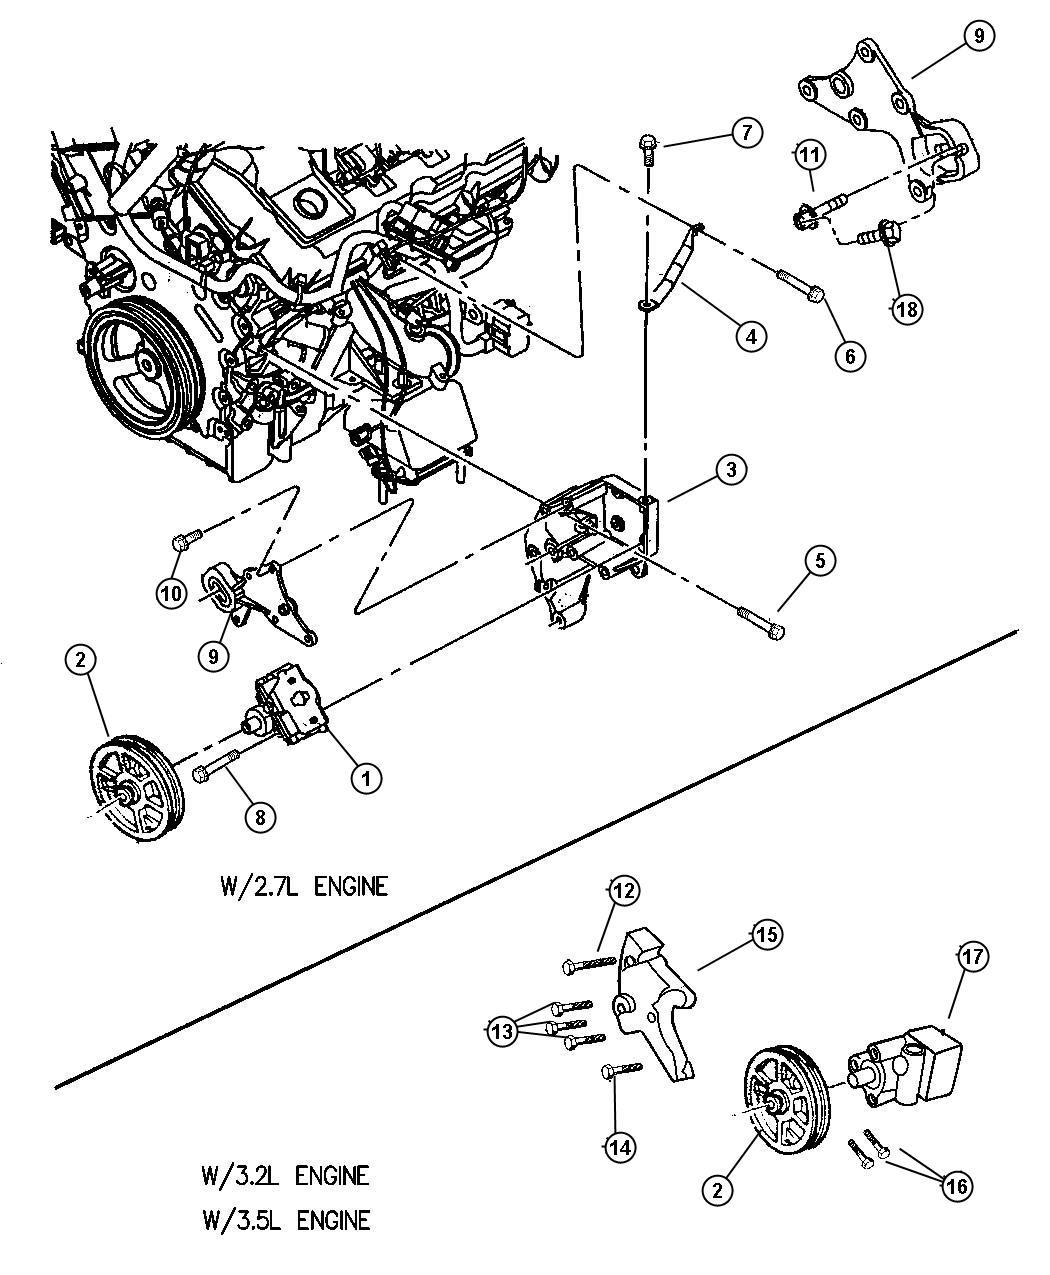 2000 Dodge Pump  Power Steering  Assys